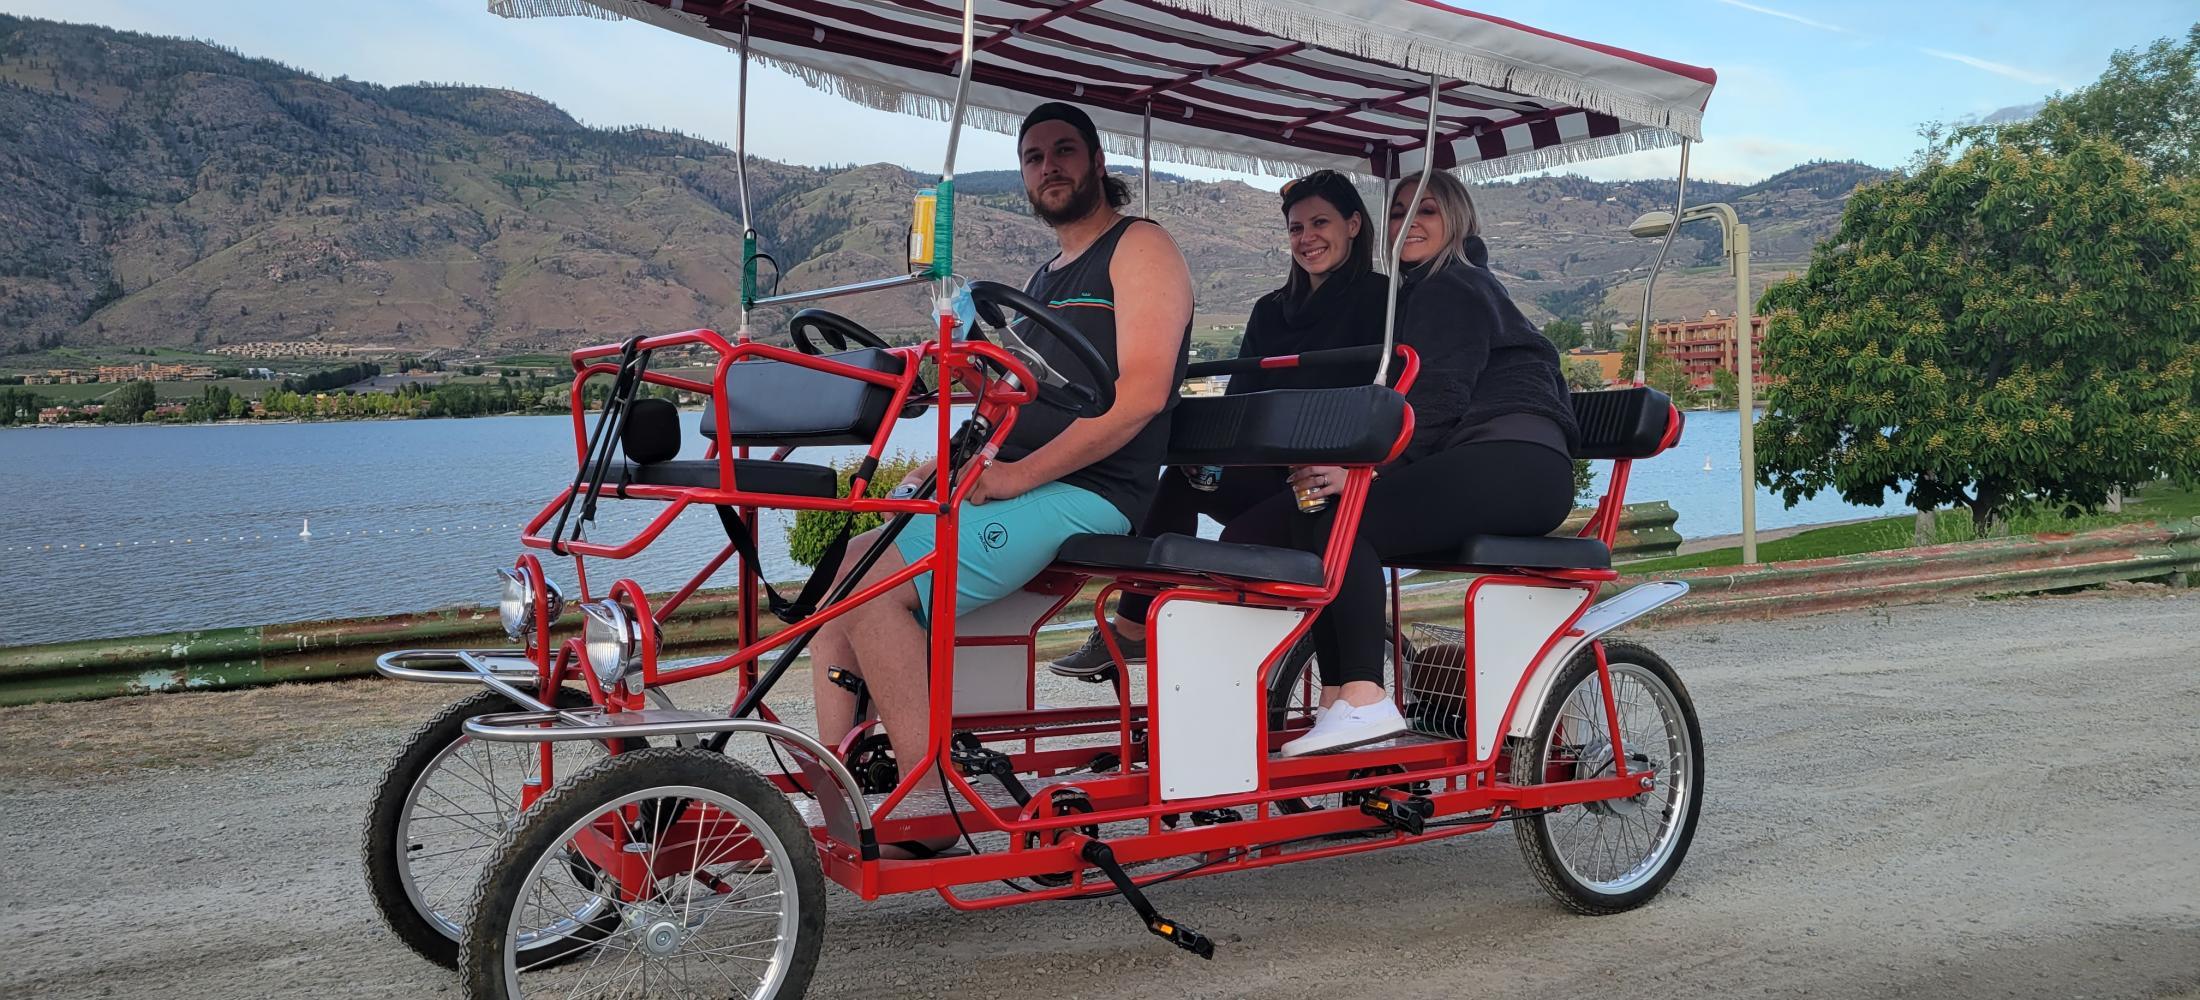 electric bikes, bicycles, bike rentals, e-bike, rentals, Osoyoos British Columbia, Canada